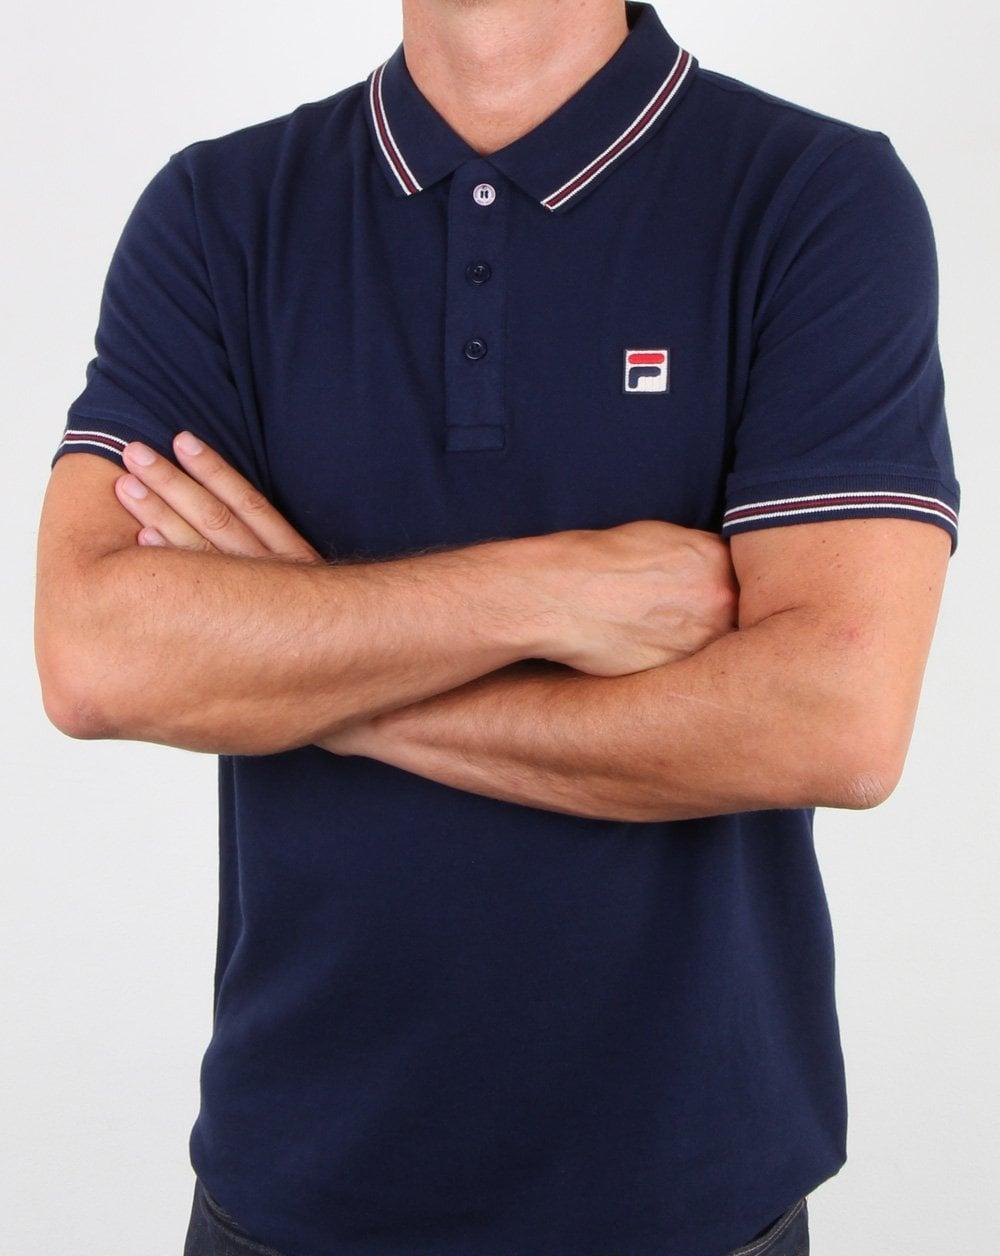 Fila Vintage Classic Tipped Polo Shirt Navy